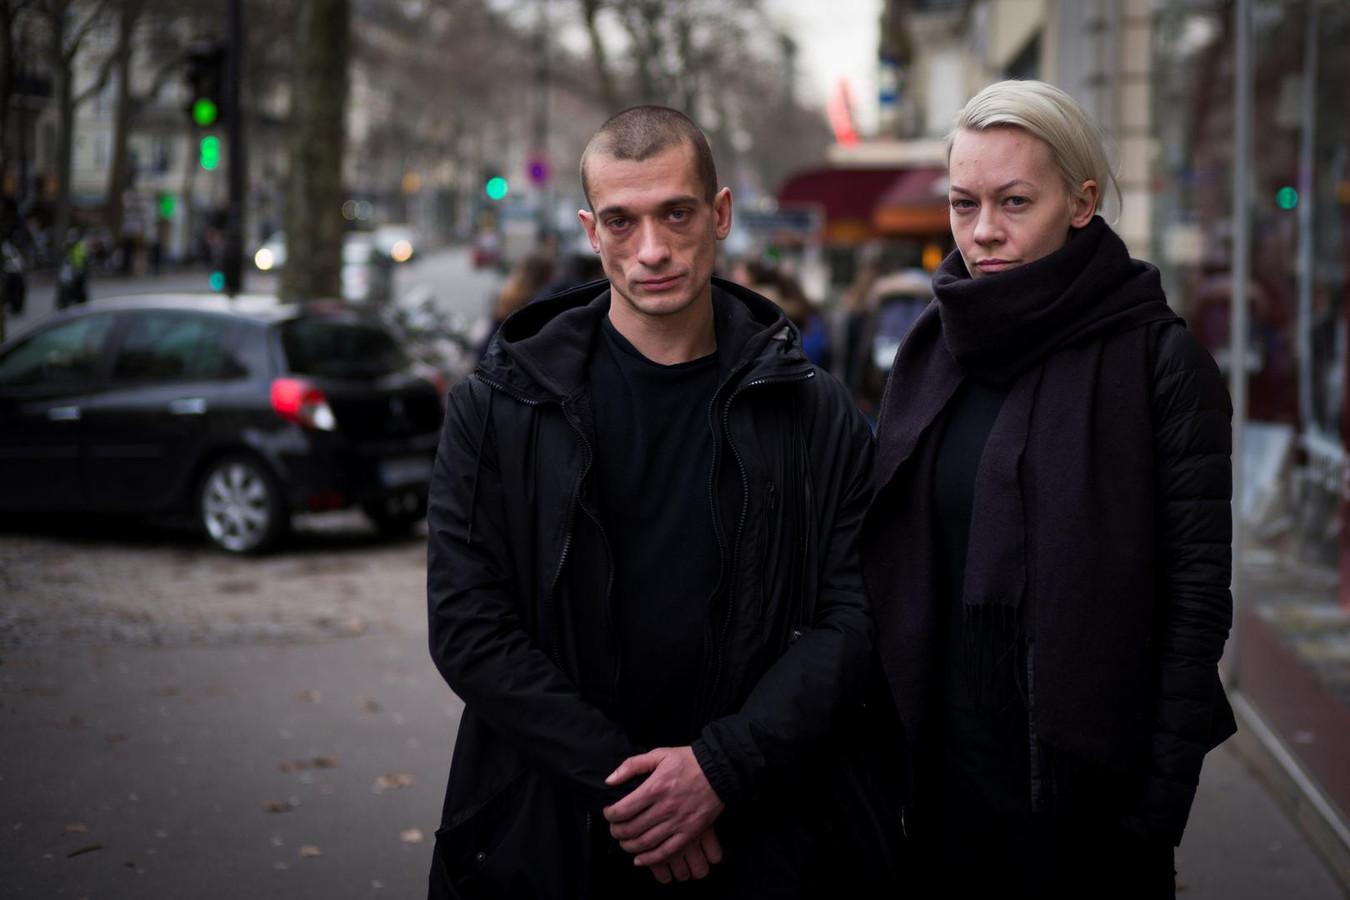 Piotr Pavlenski et son ex-compagne Oksana Chaliguina